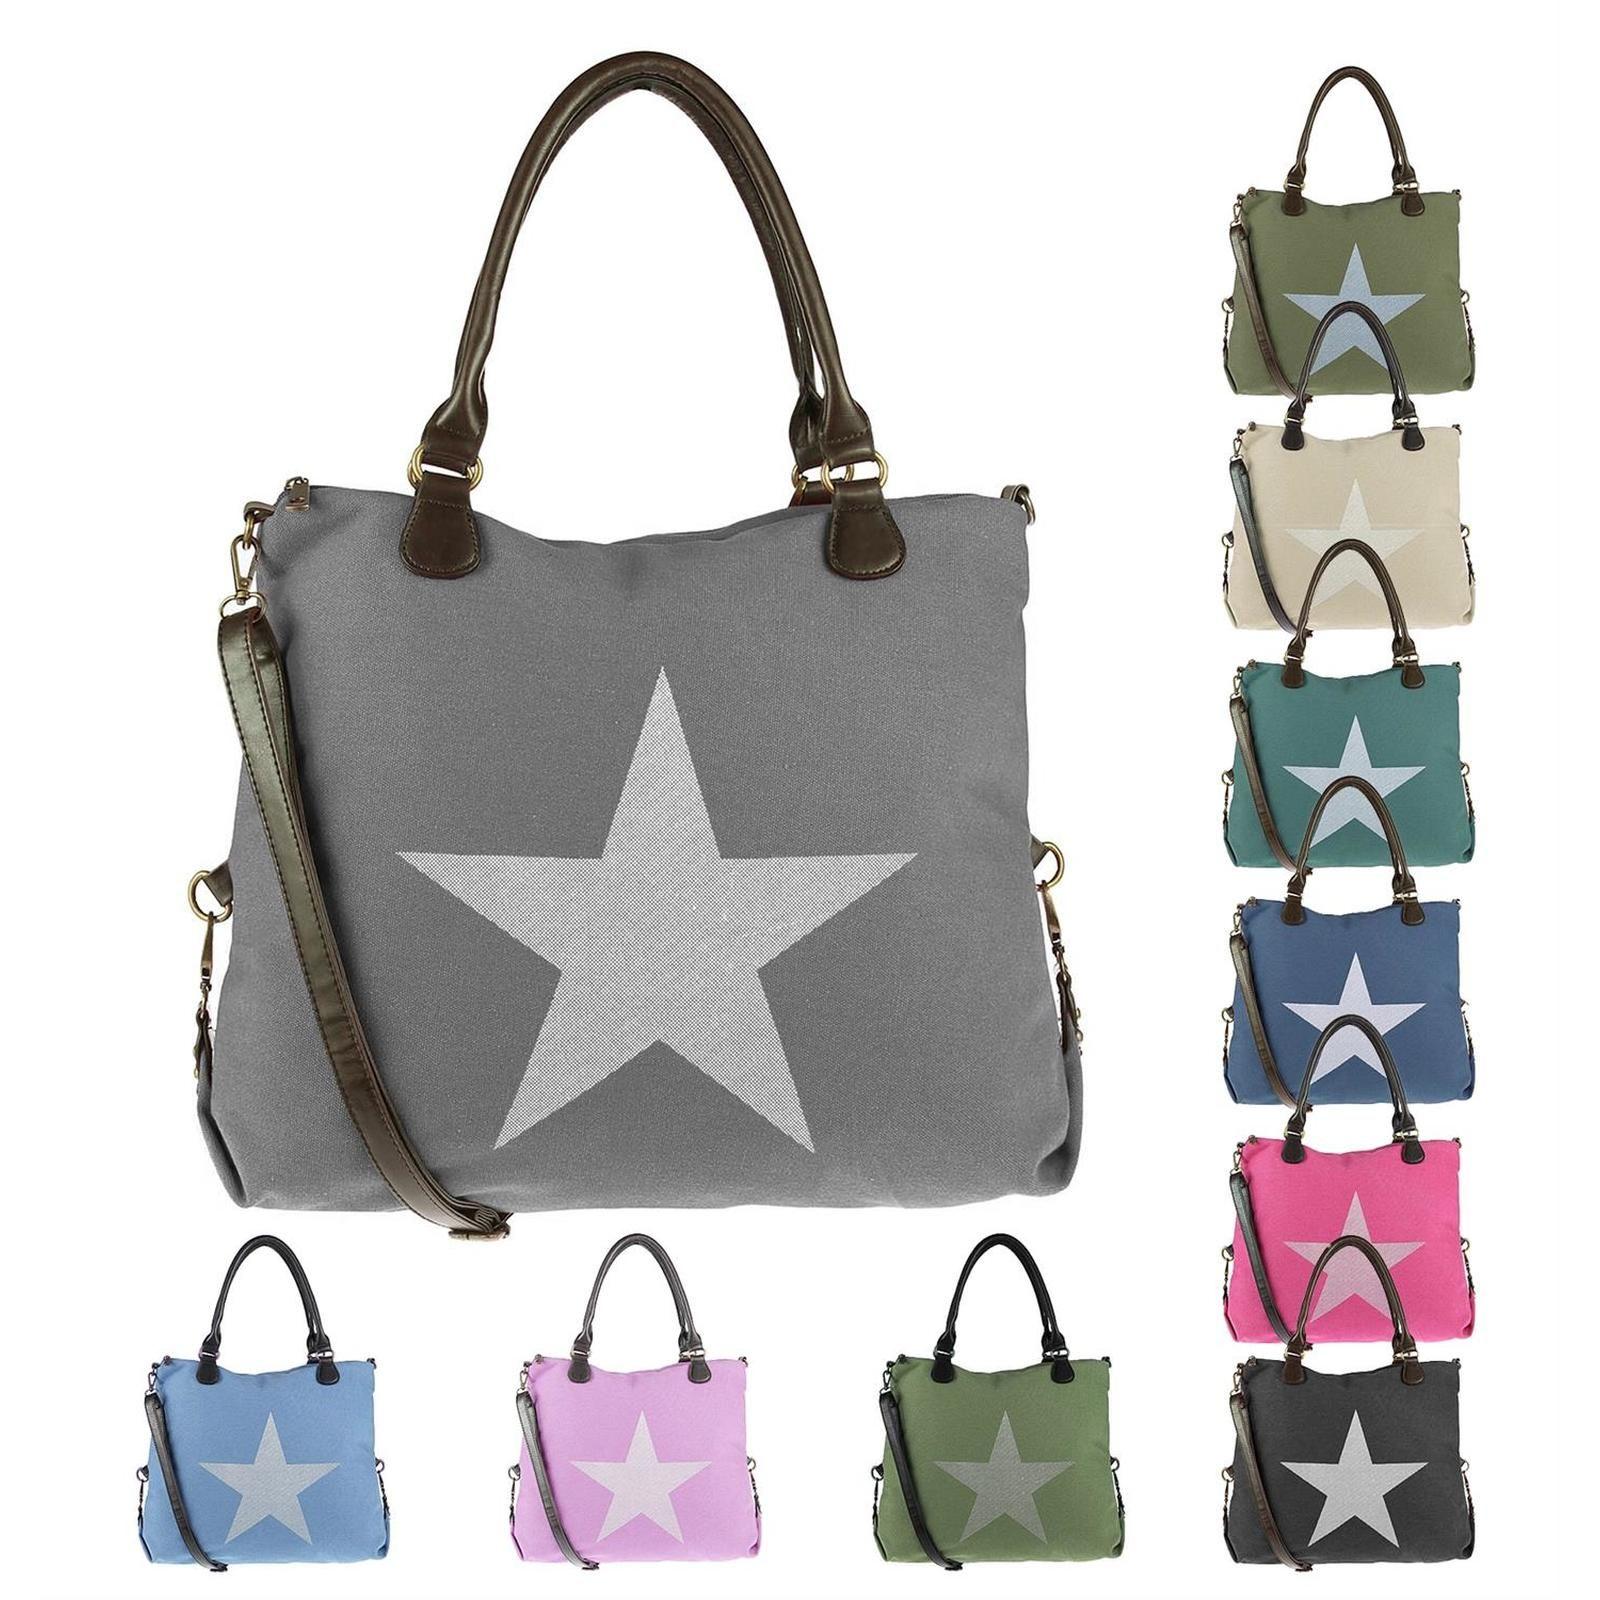 Damen XXL Stern Shopper Tasche Handtasche Damentasche Canvas